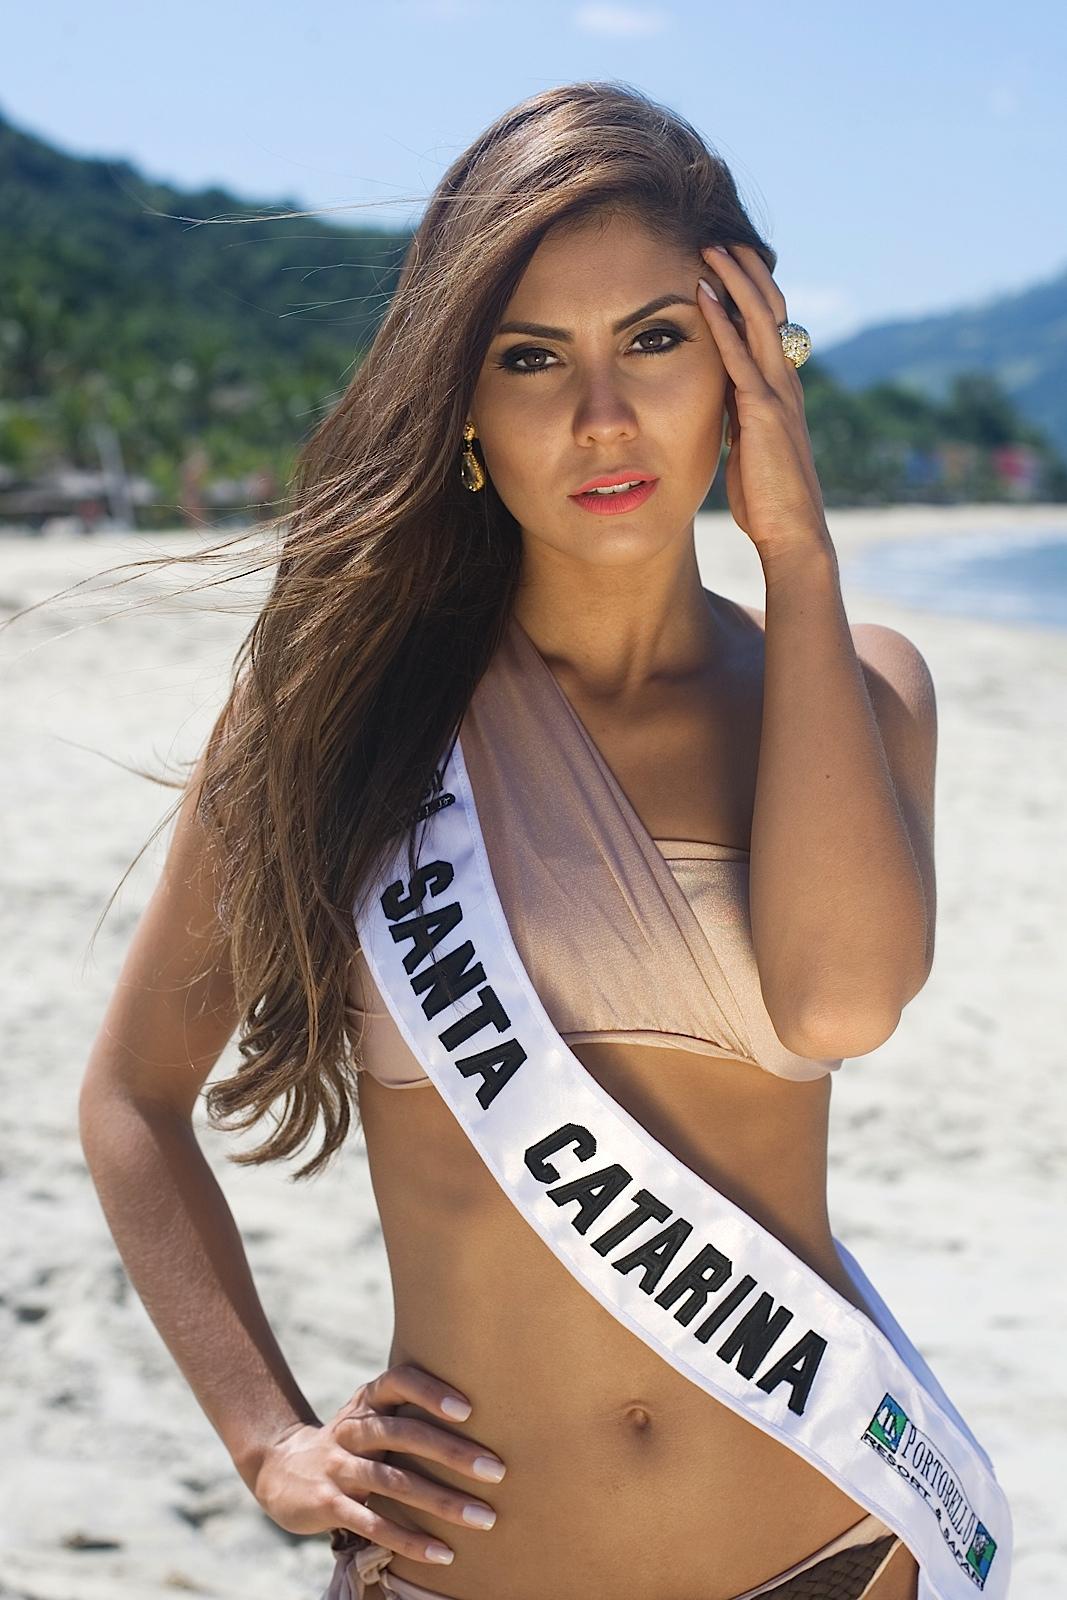 thainara latenik, miss brasil continentes unidos 2013. Ulg7yol5